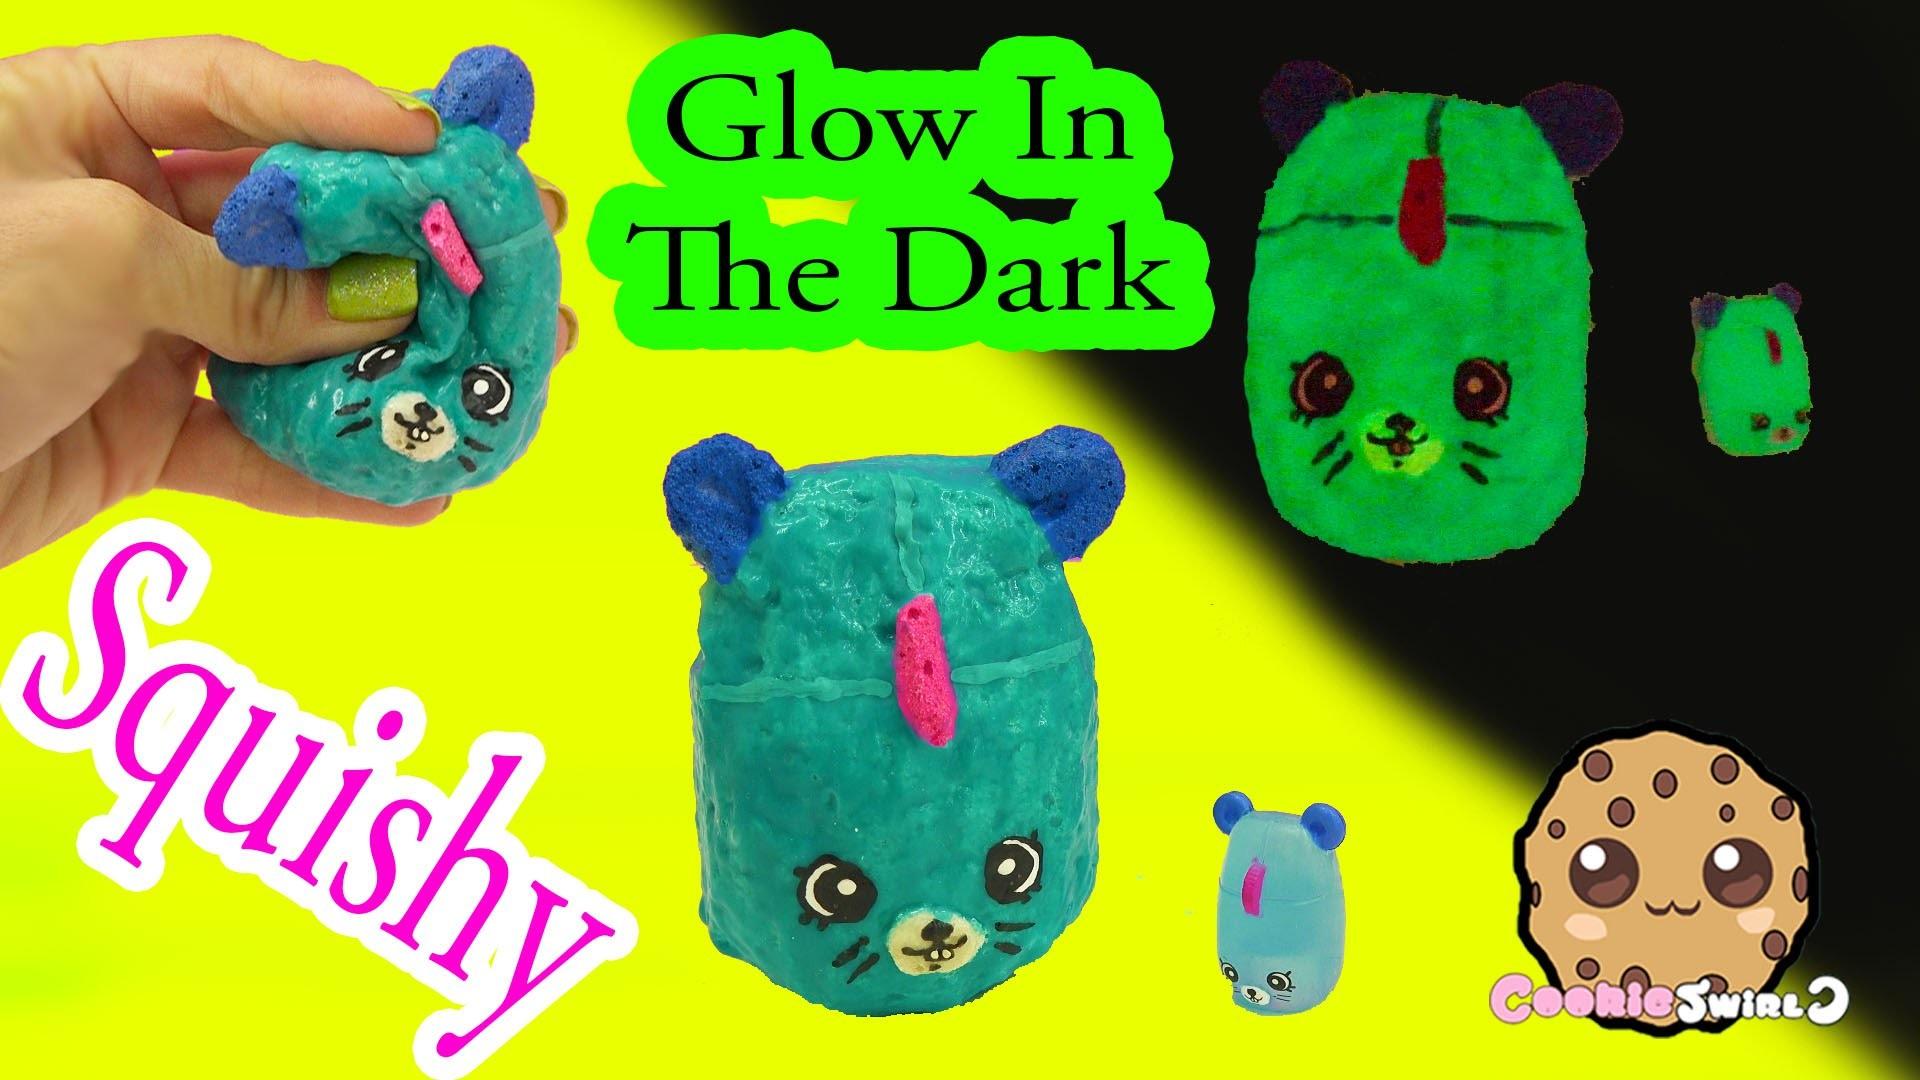 DIY Glow In The Dark Squishy Shopkins Season 5 Petkins Inspired Craft Do It Yourself by Cookieswirlc